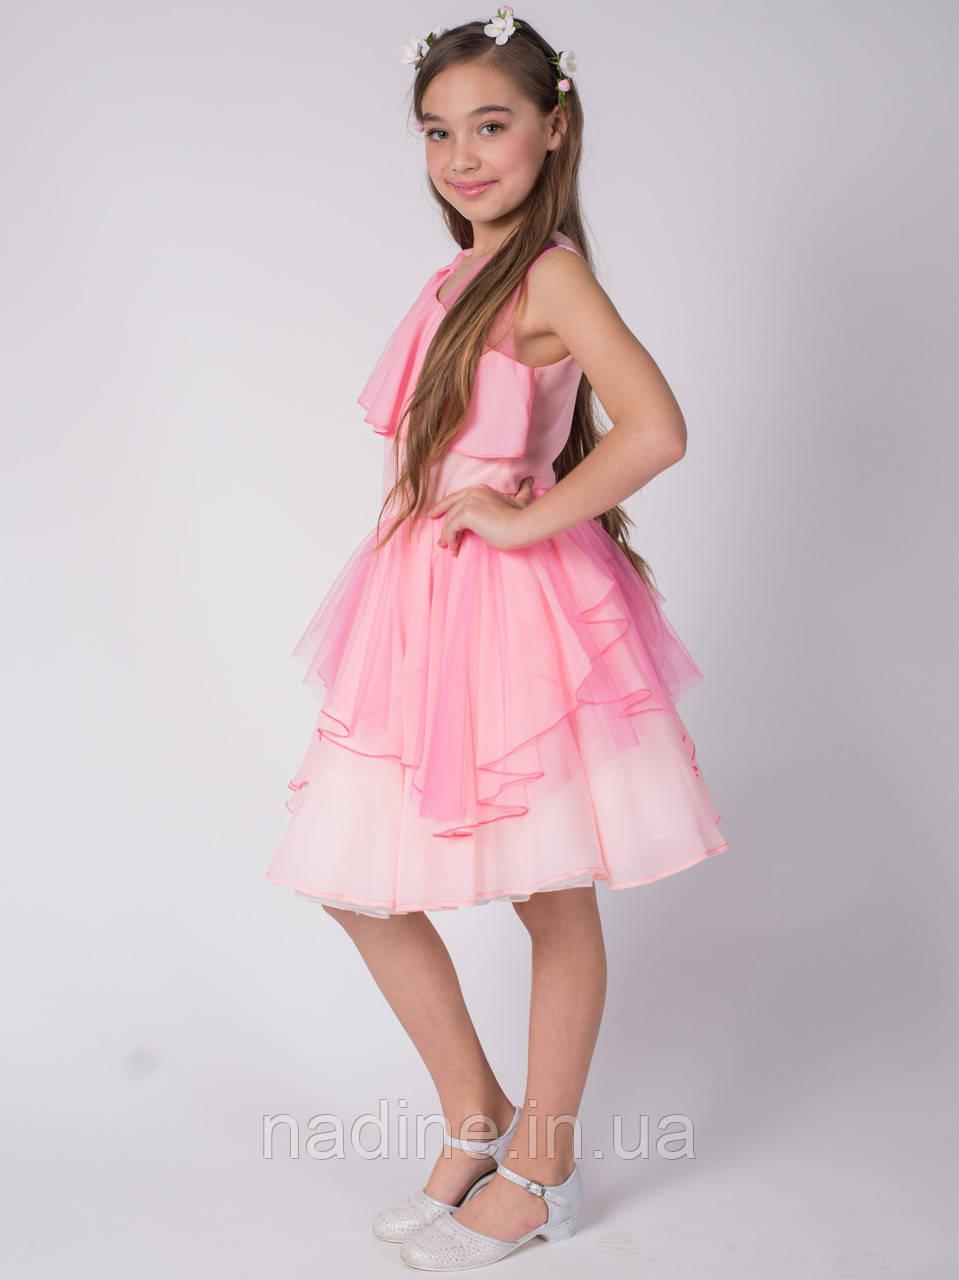 Дизайнерське плаття Nadine, Romantic Sakura 140 .Ніжно рожеве